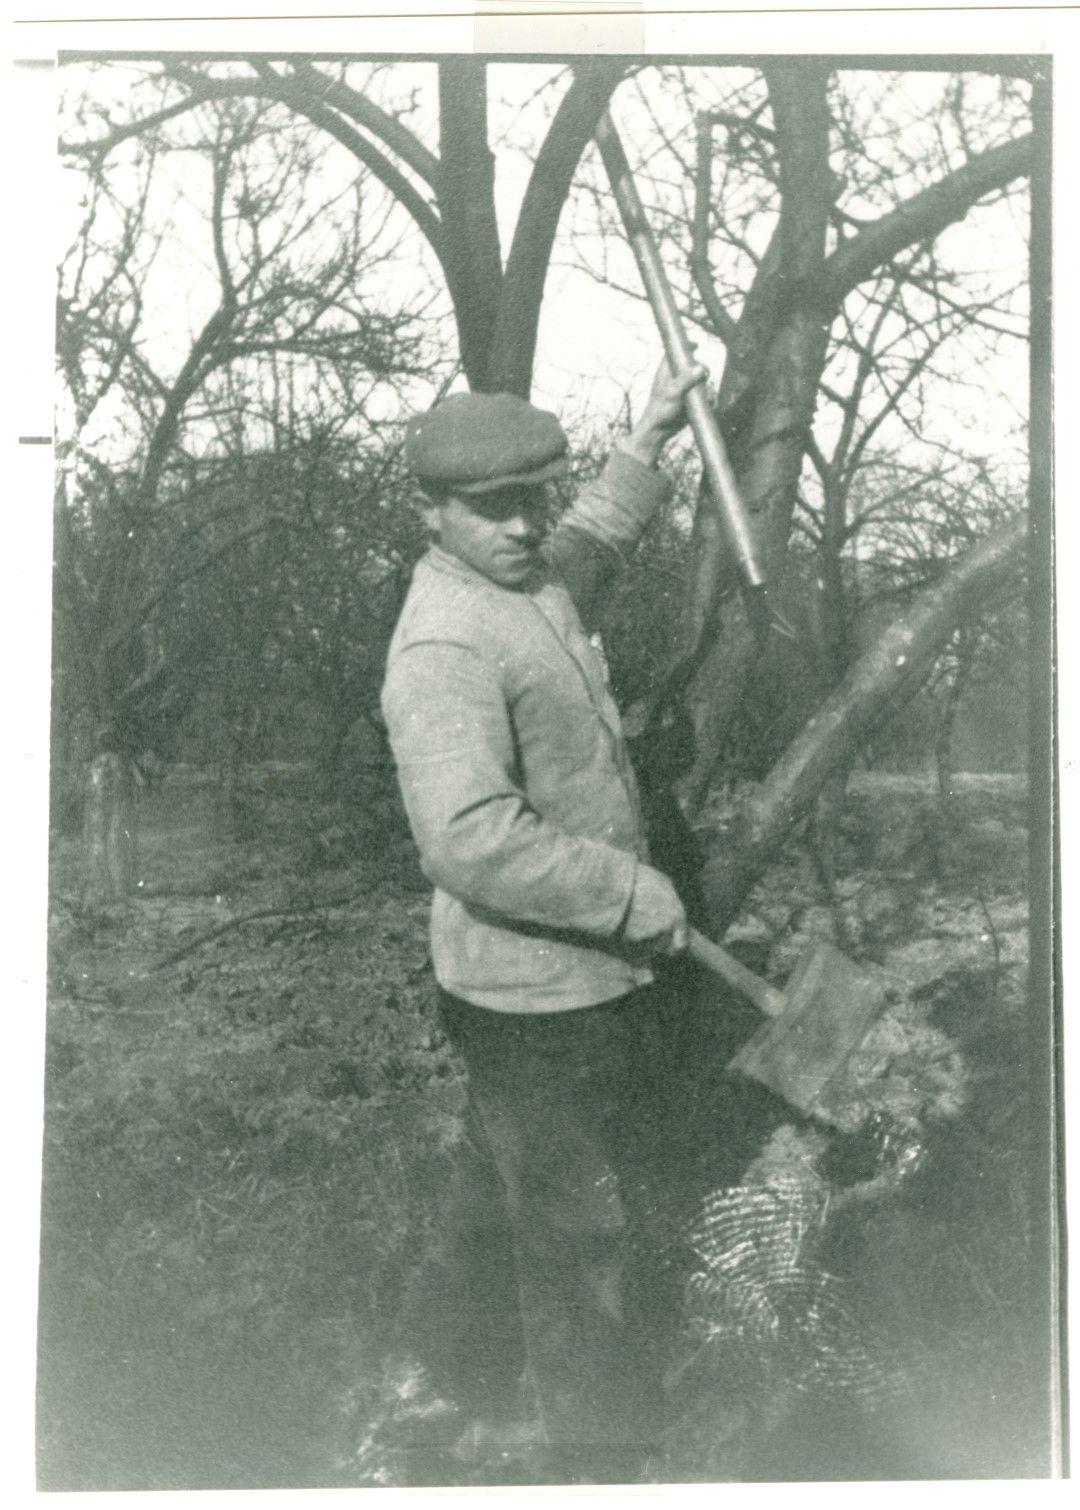 Arbeider gebruikt snoeibeitel met korte sleg.